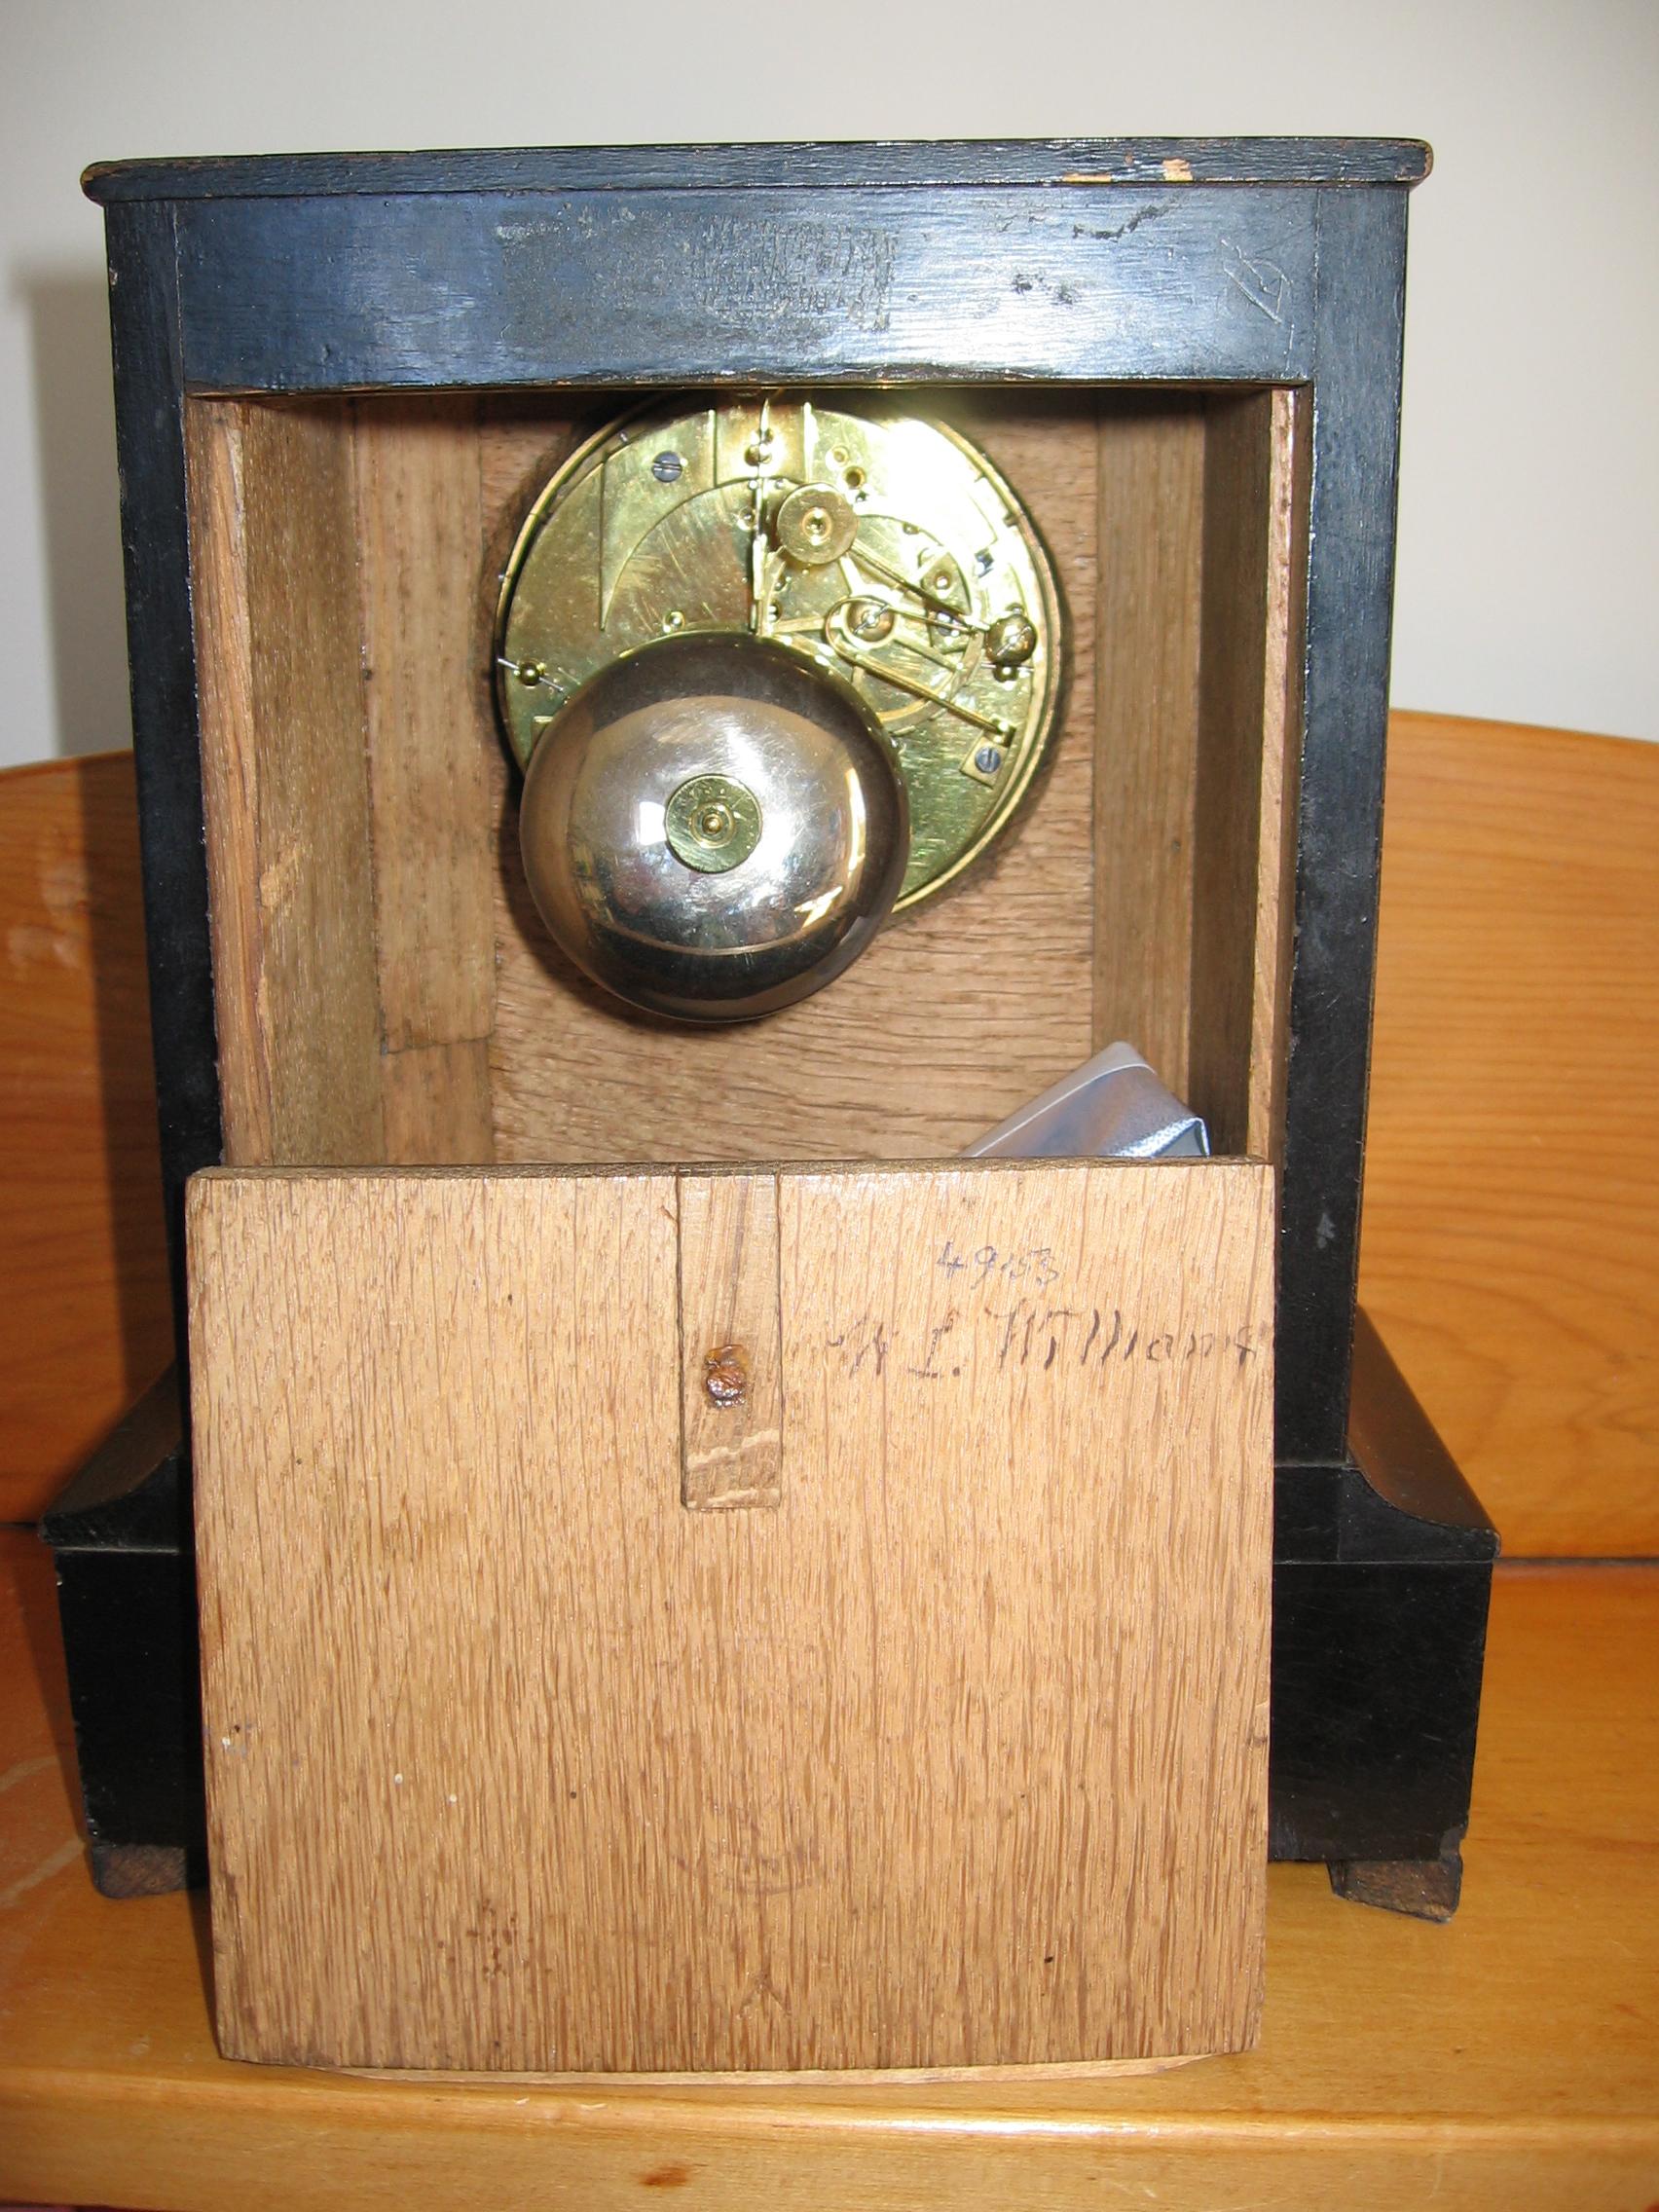 Back/Interior of Mantlepiece Clock